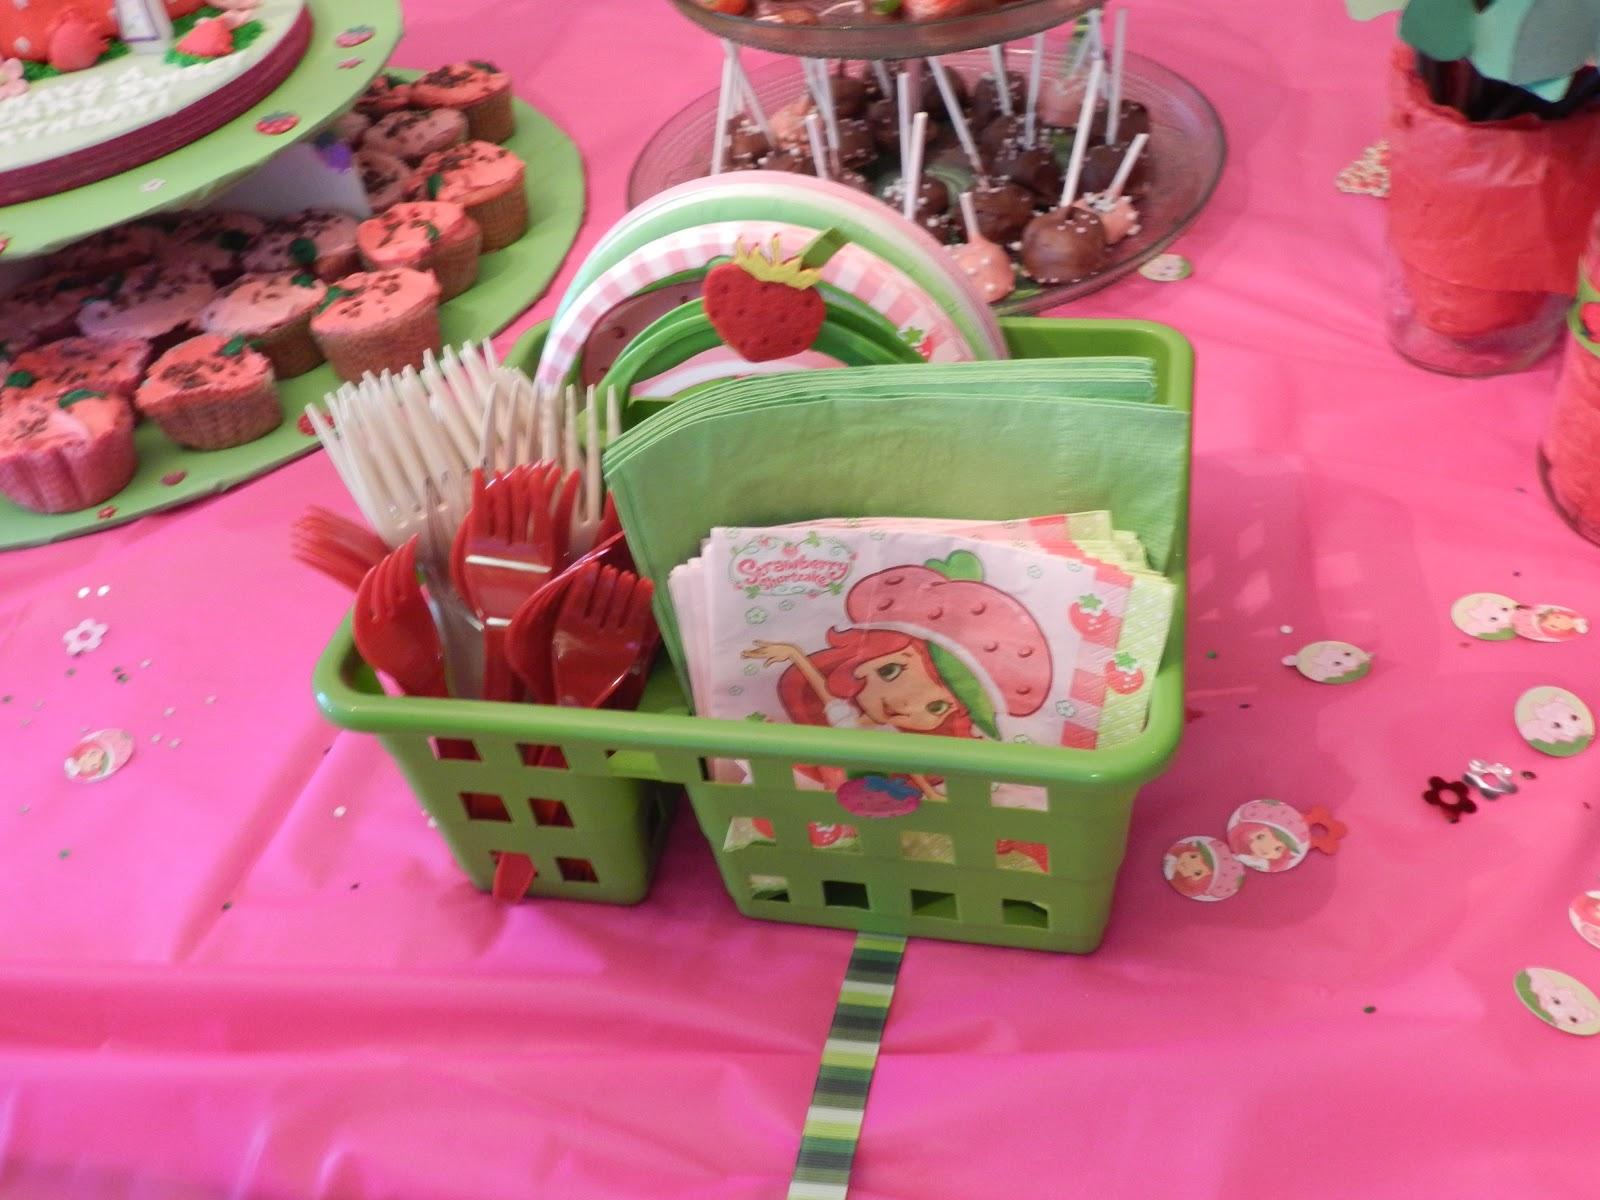 Candy Pretzel Parties: Strawberry Shortcake Party